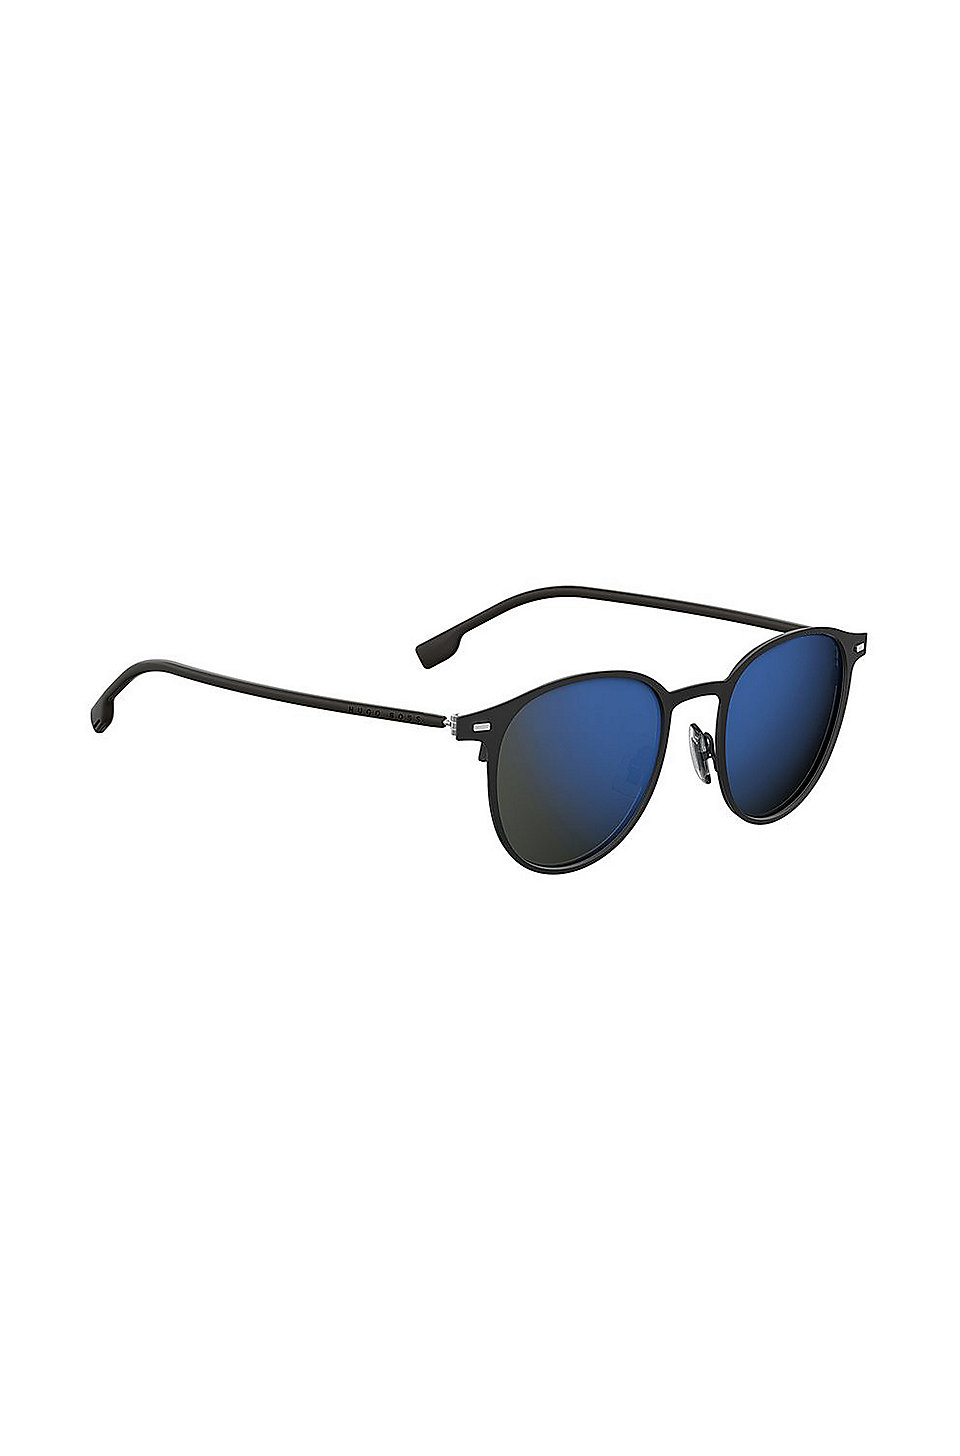 59e5e07a957 BOSS - Black-steel sunglasses with mirrored lenses